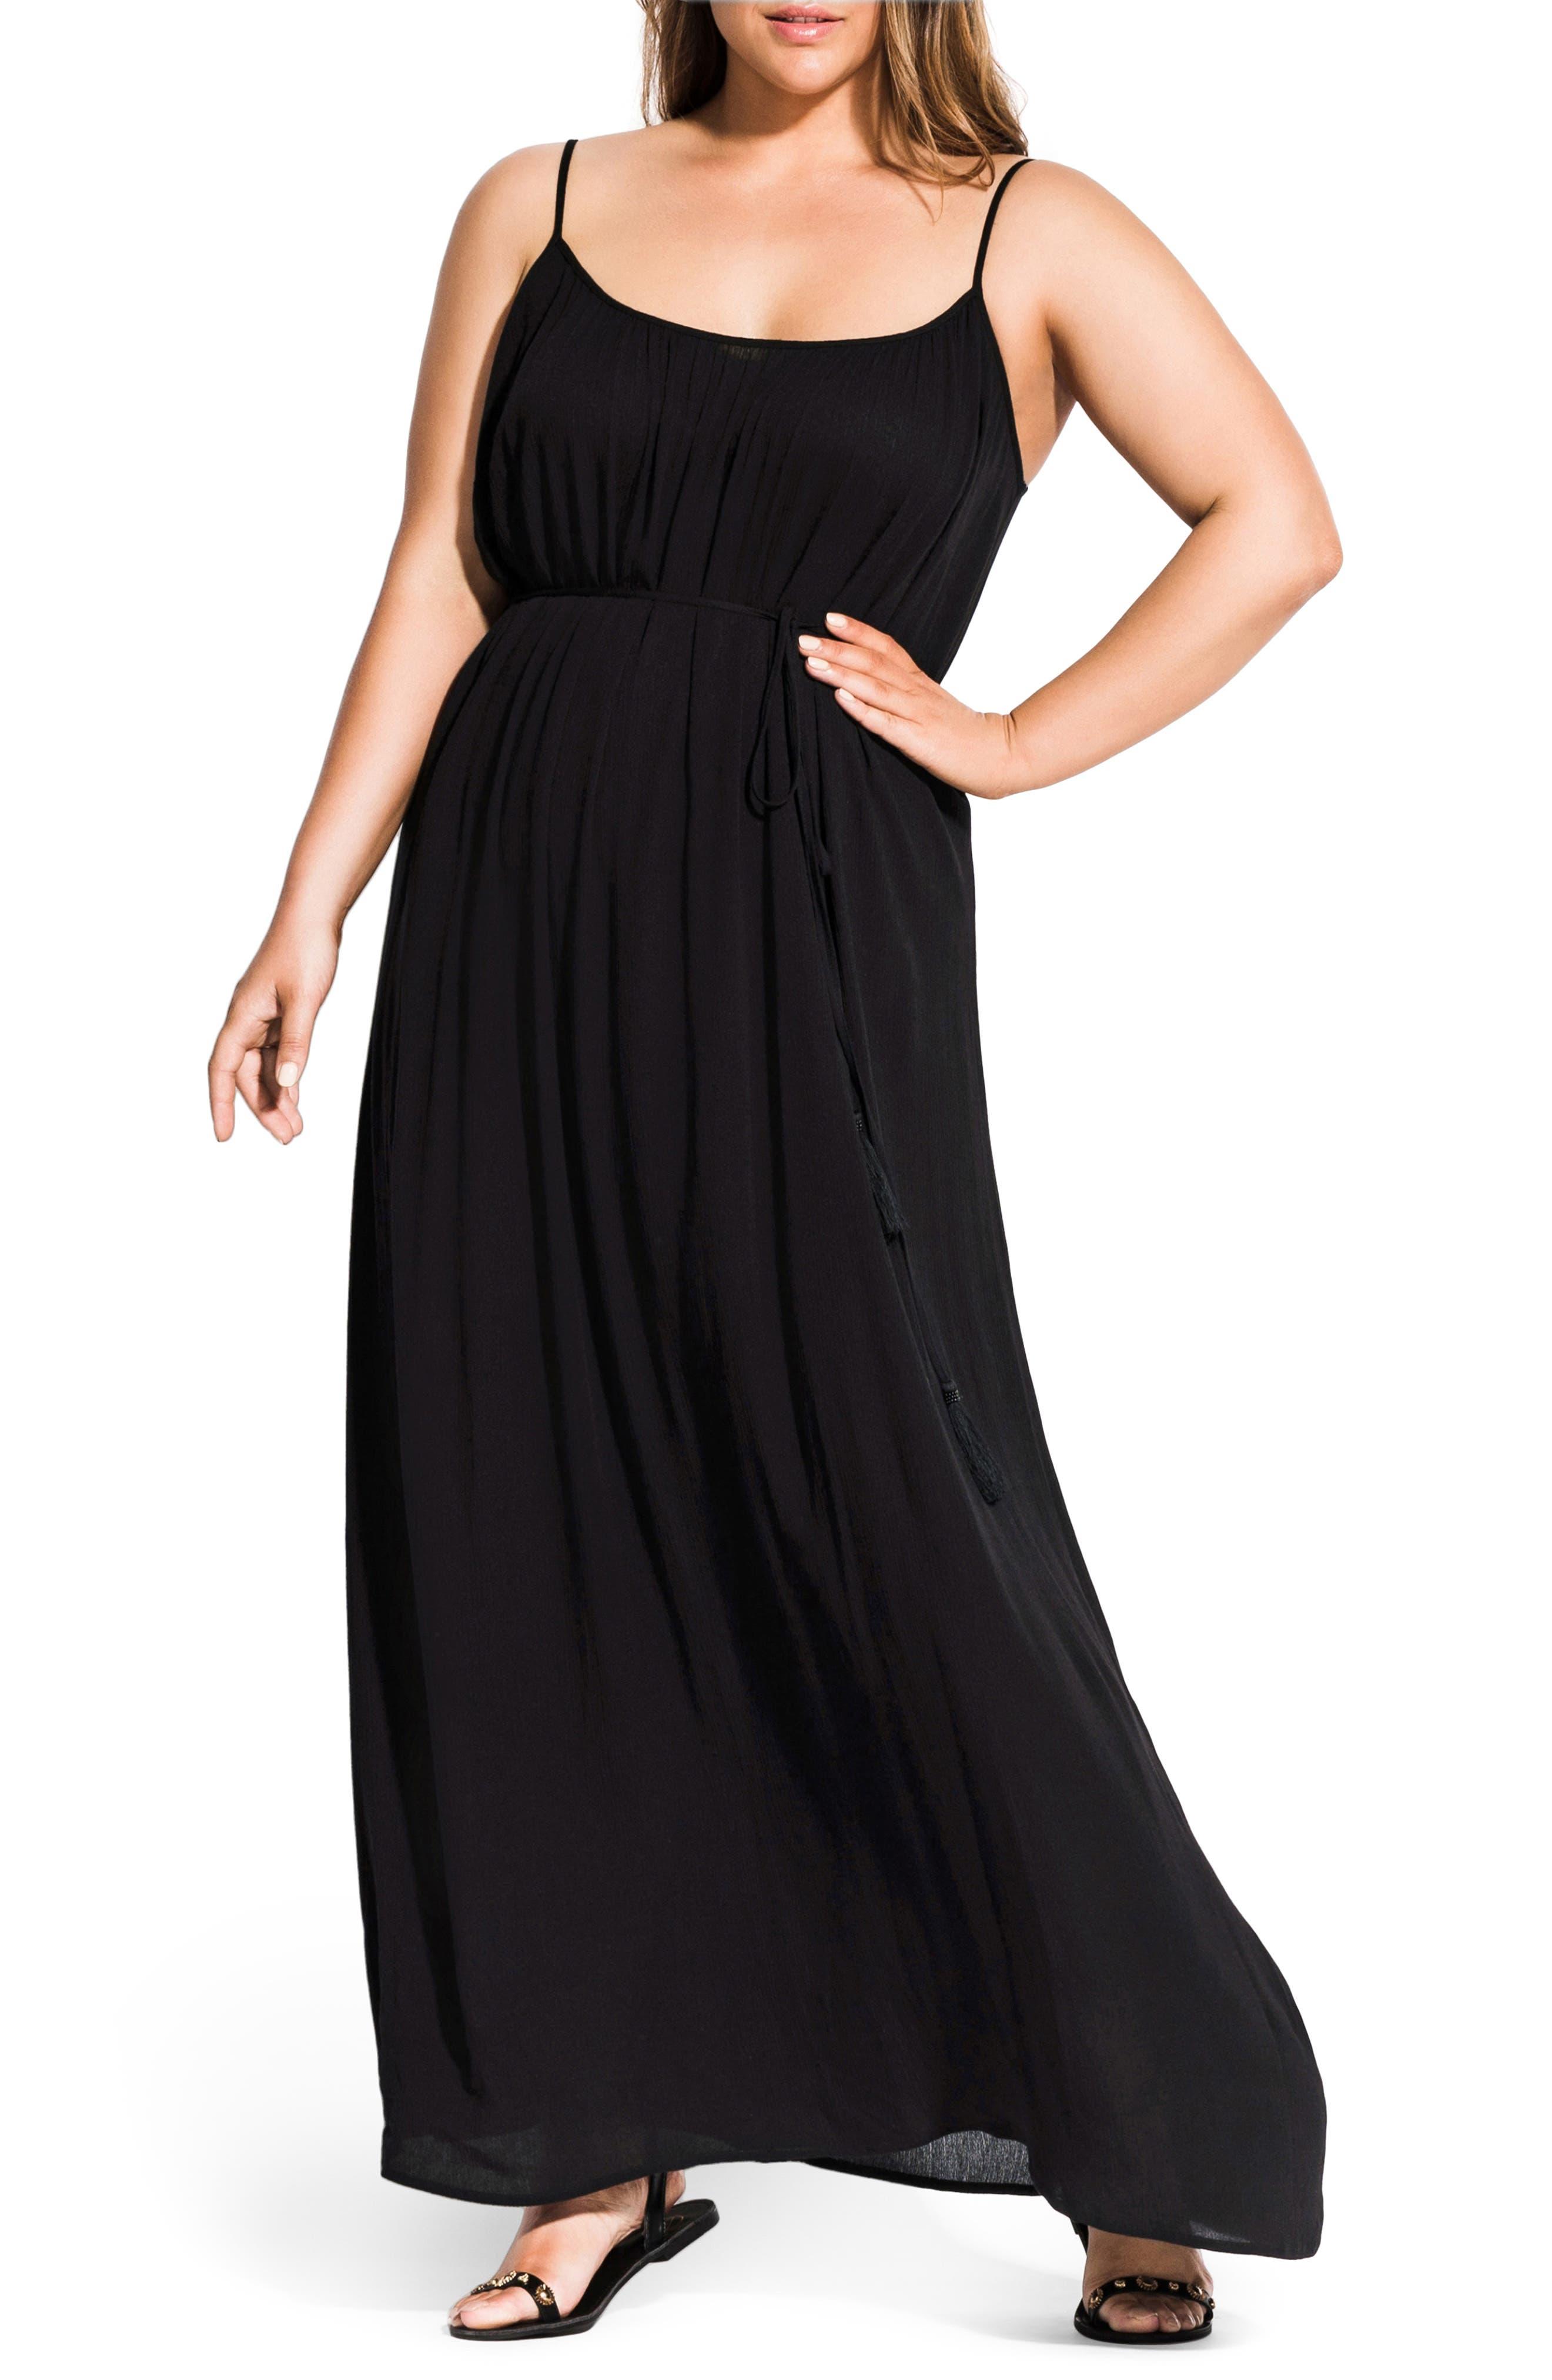 c1baad1234e3 Plus Size Chic City Paradise Maxi Dress, Black